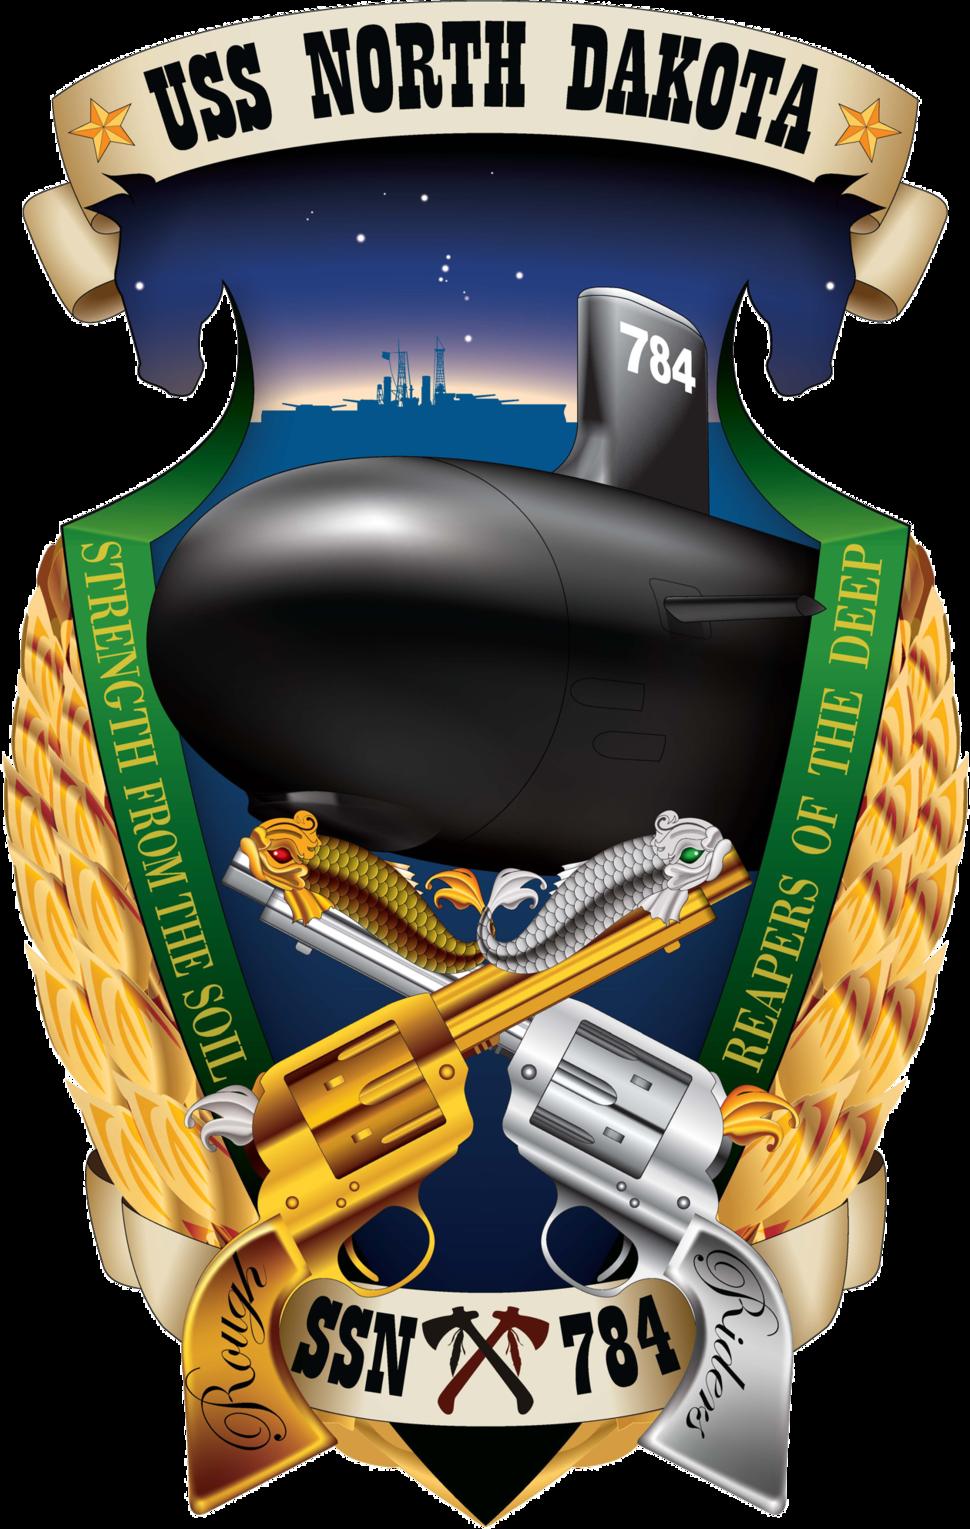 USS North Dakota (SSN-784) crest 2013